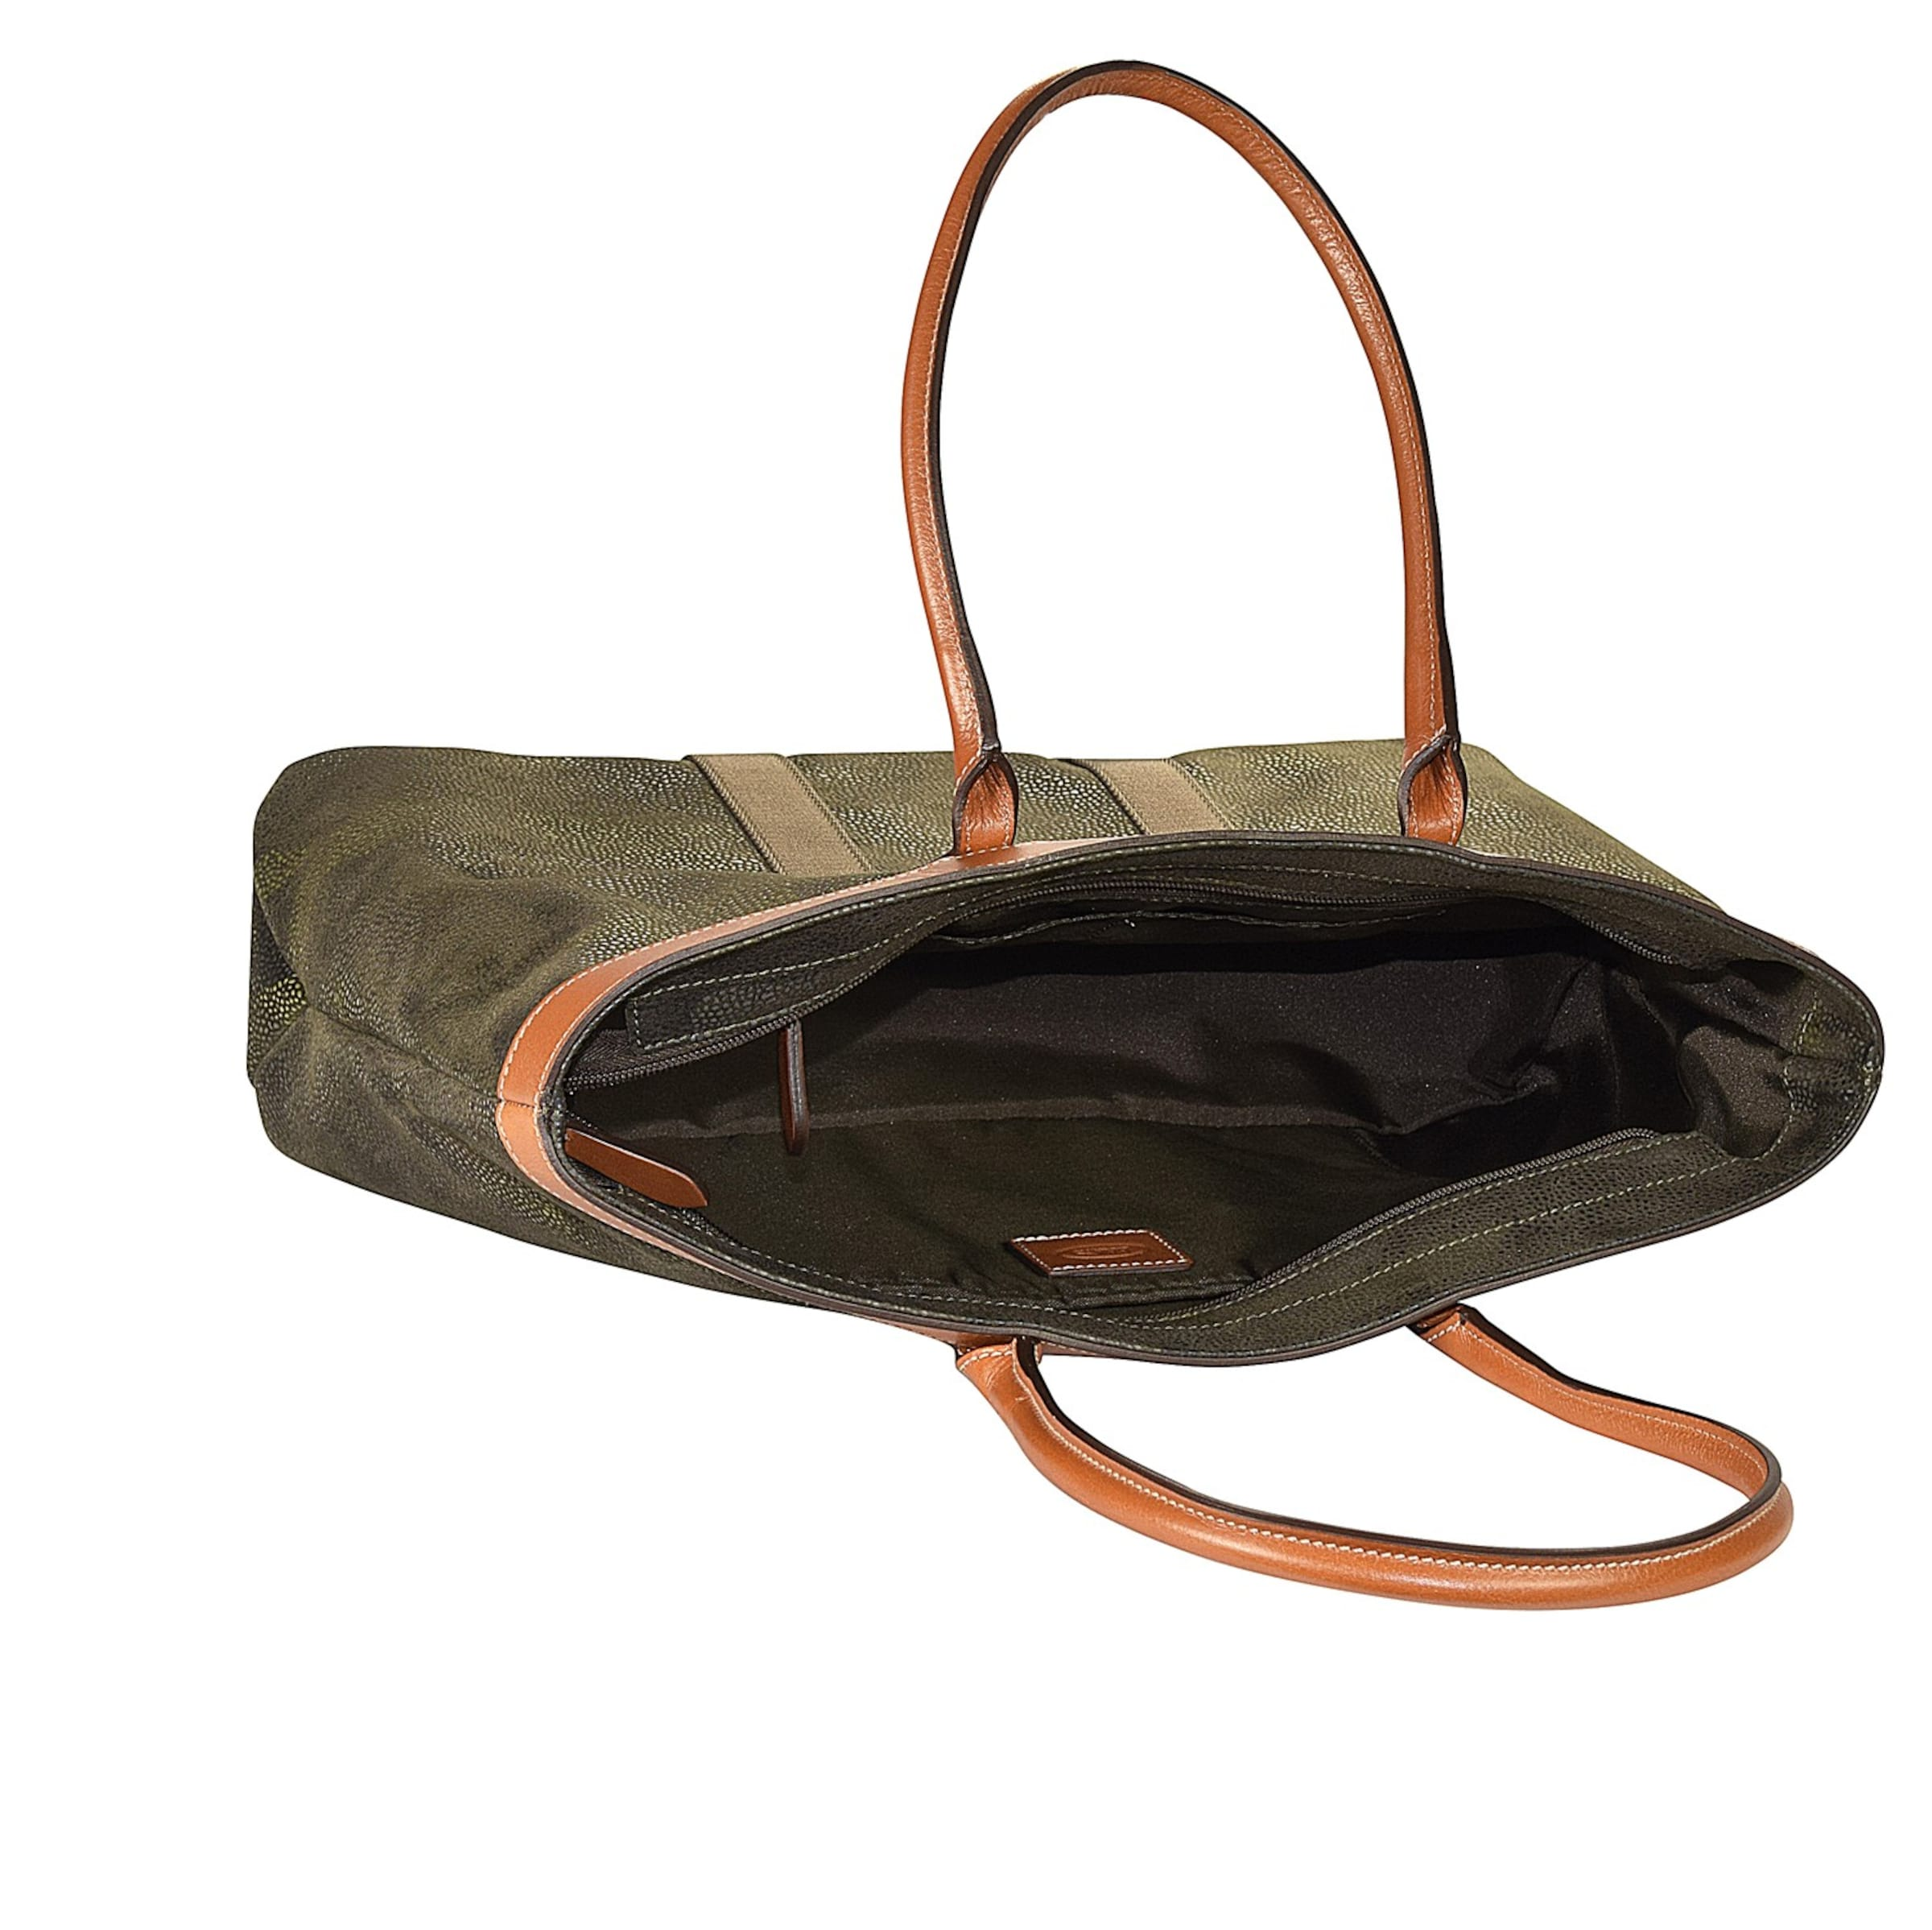 Shopper Shopper Bric's cm Tasche cm 43 43 Bric's Tasche nxB1tRO